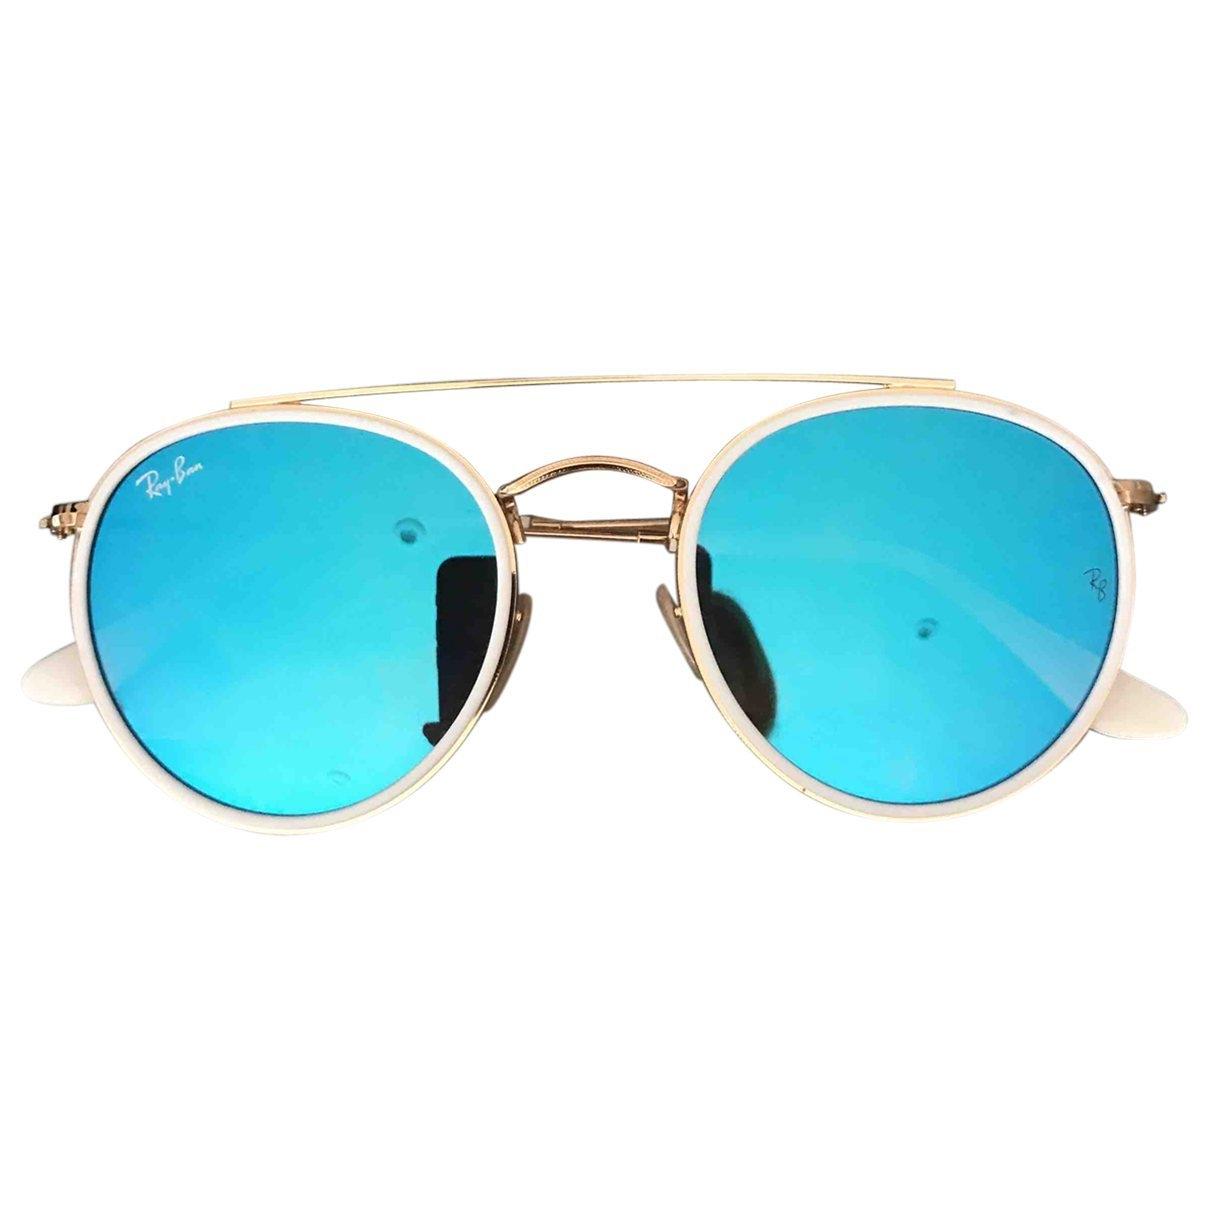 Ray-ban \N Sonnenbrillen in  Bunt Metall